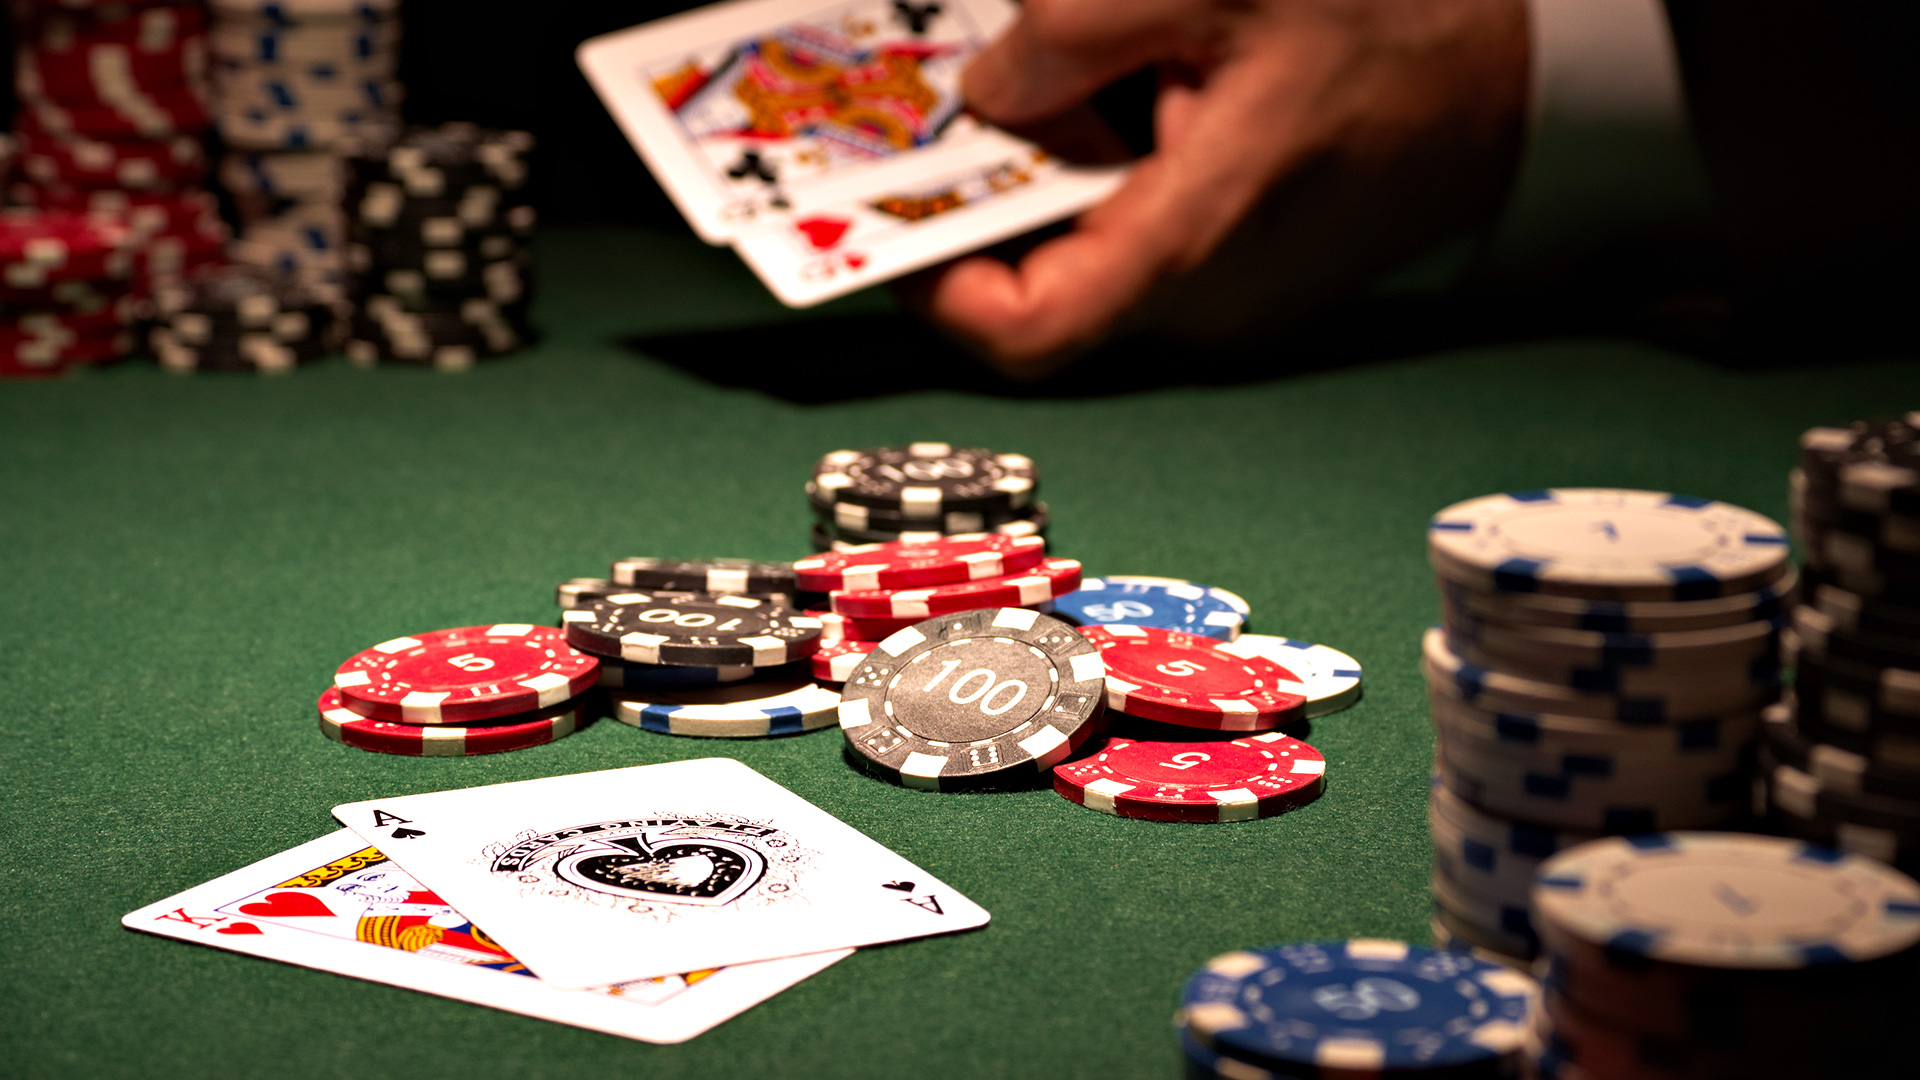 gambling laws games of skill